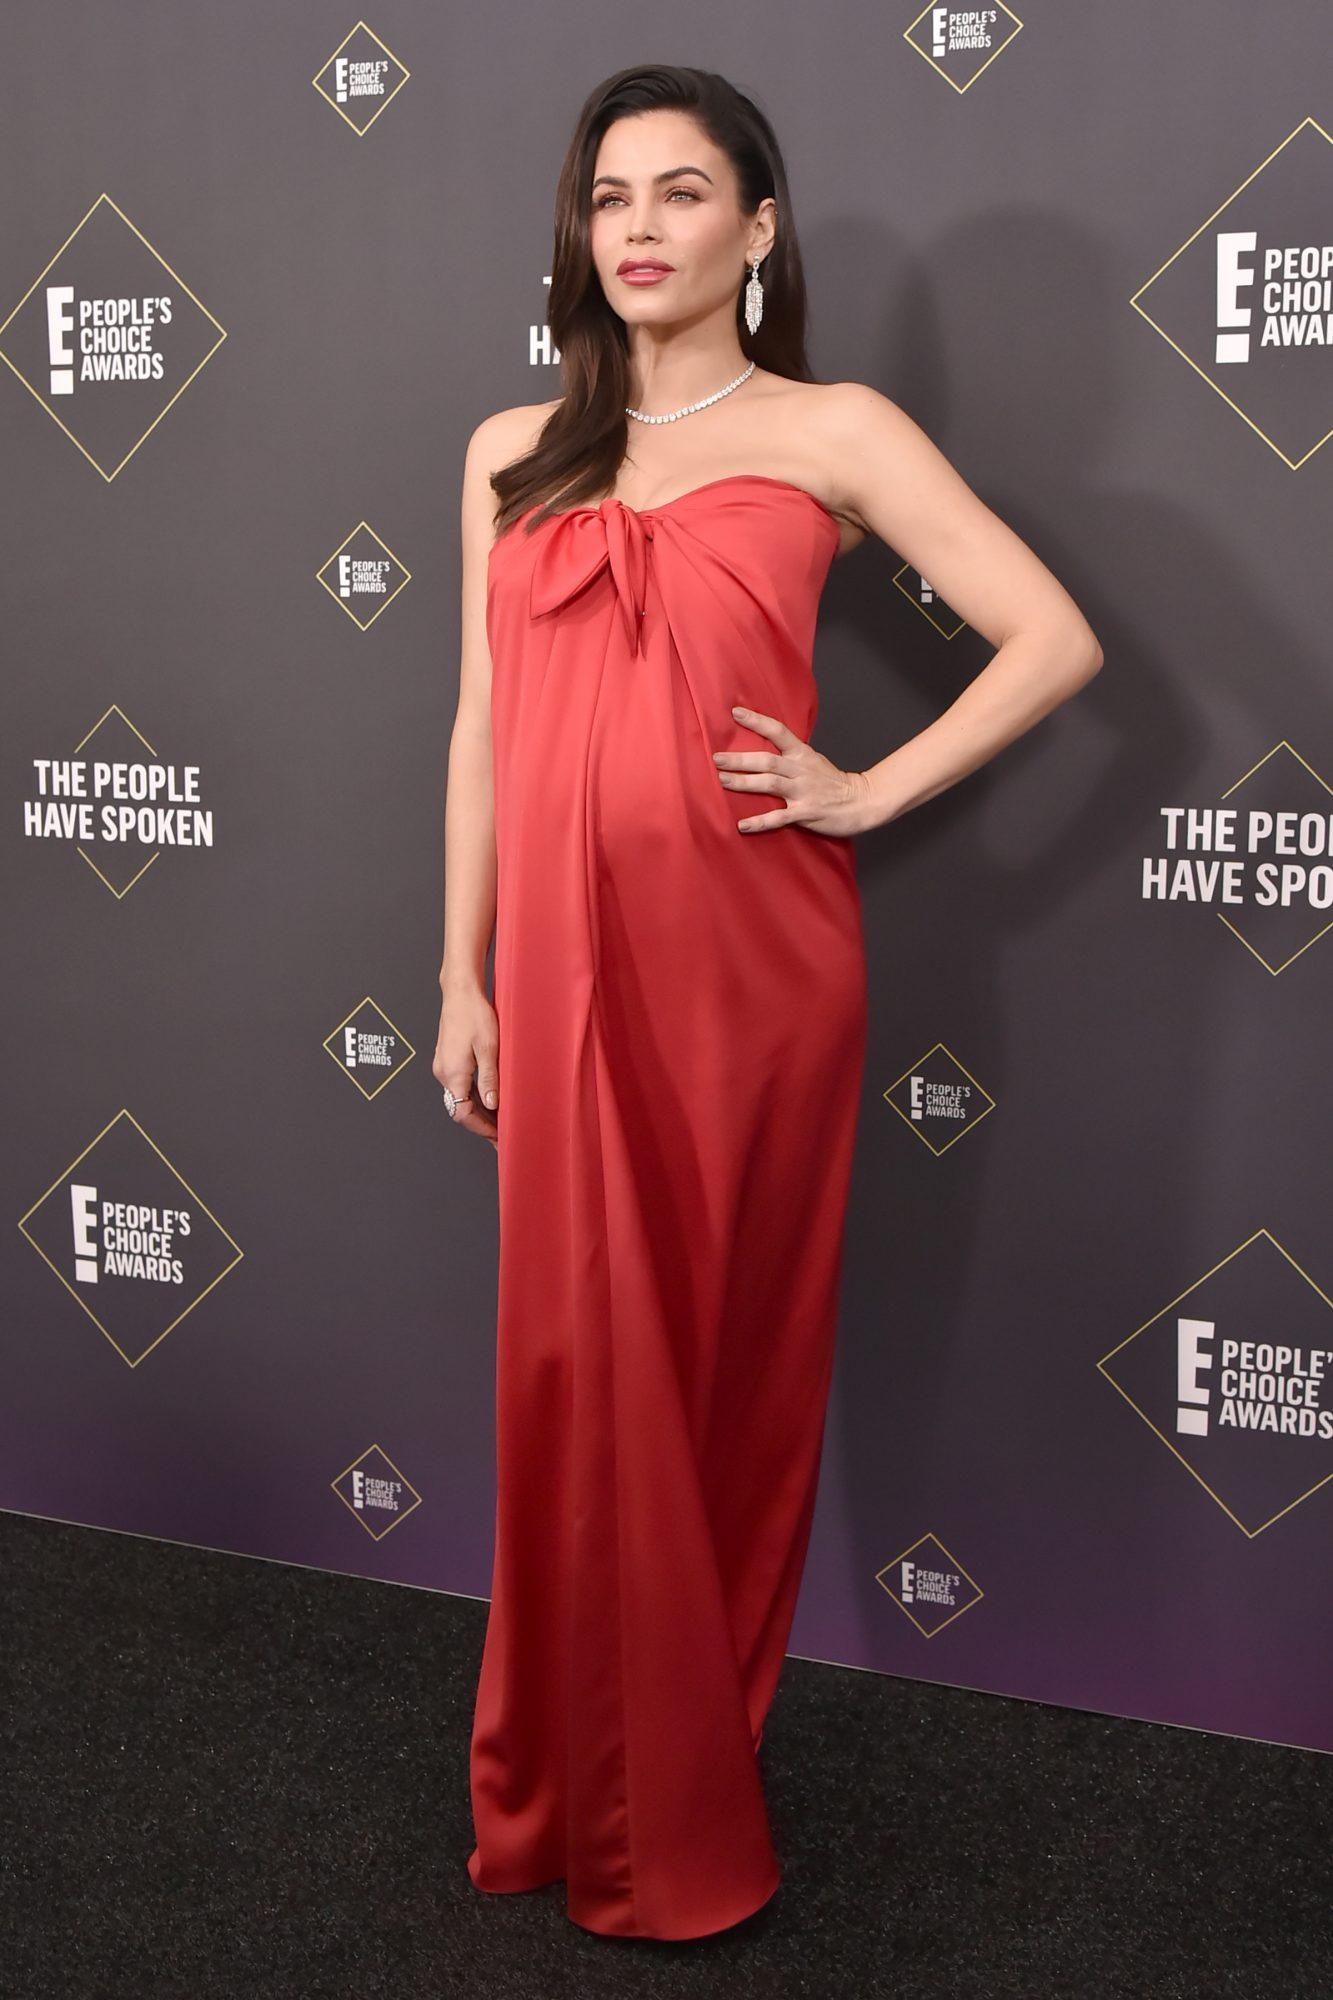 2019 E! People's Choice Awards - Press Room